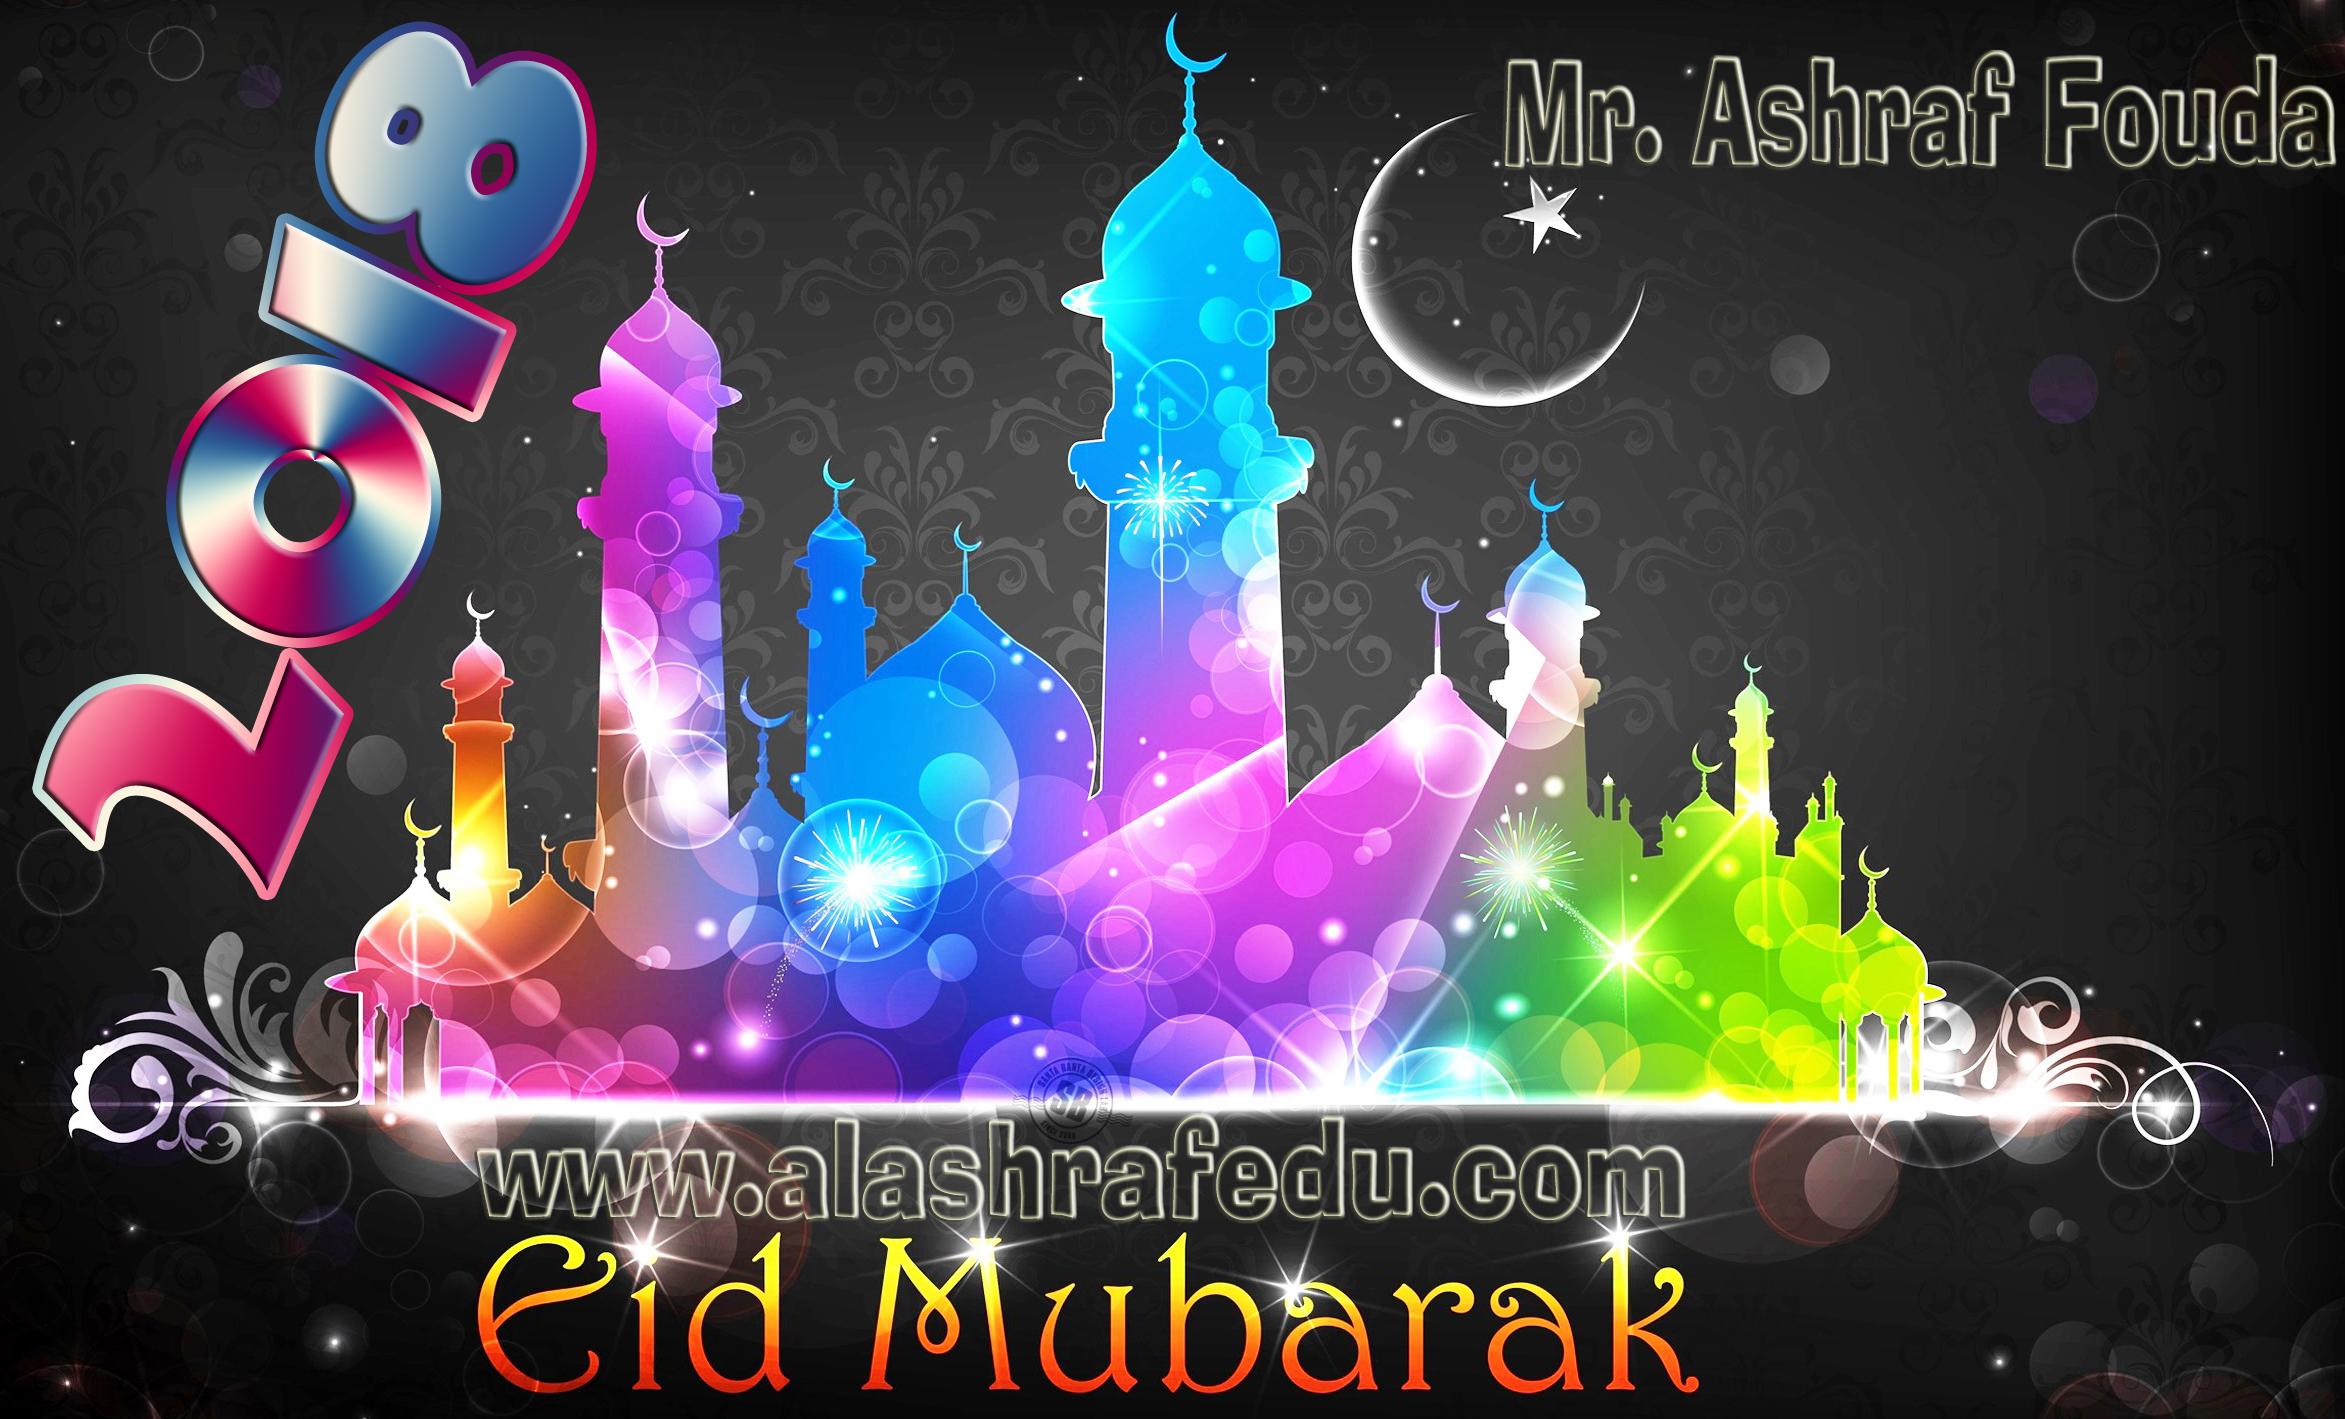 Mubarak 2018 www.alashrafedu.com1